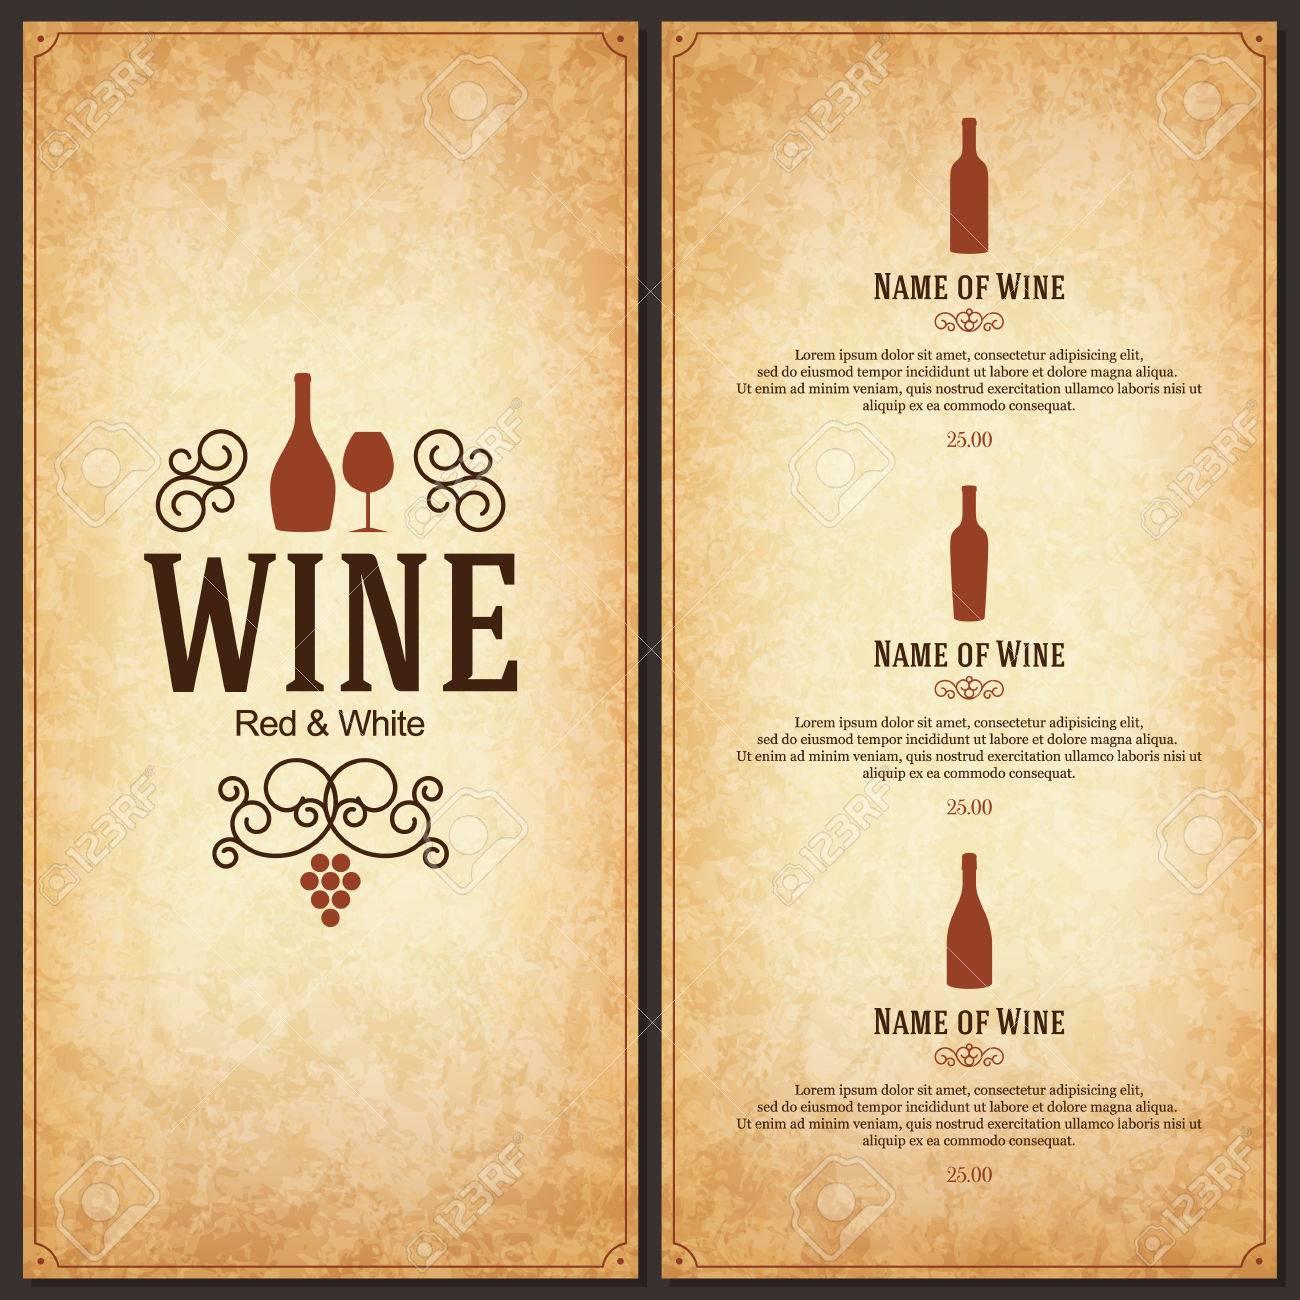 Wine list design - 37727024